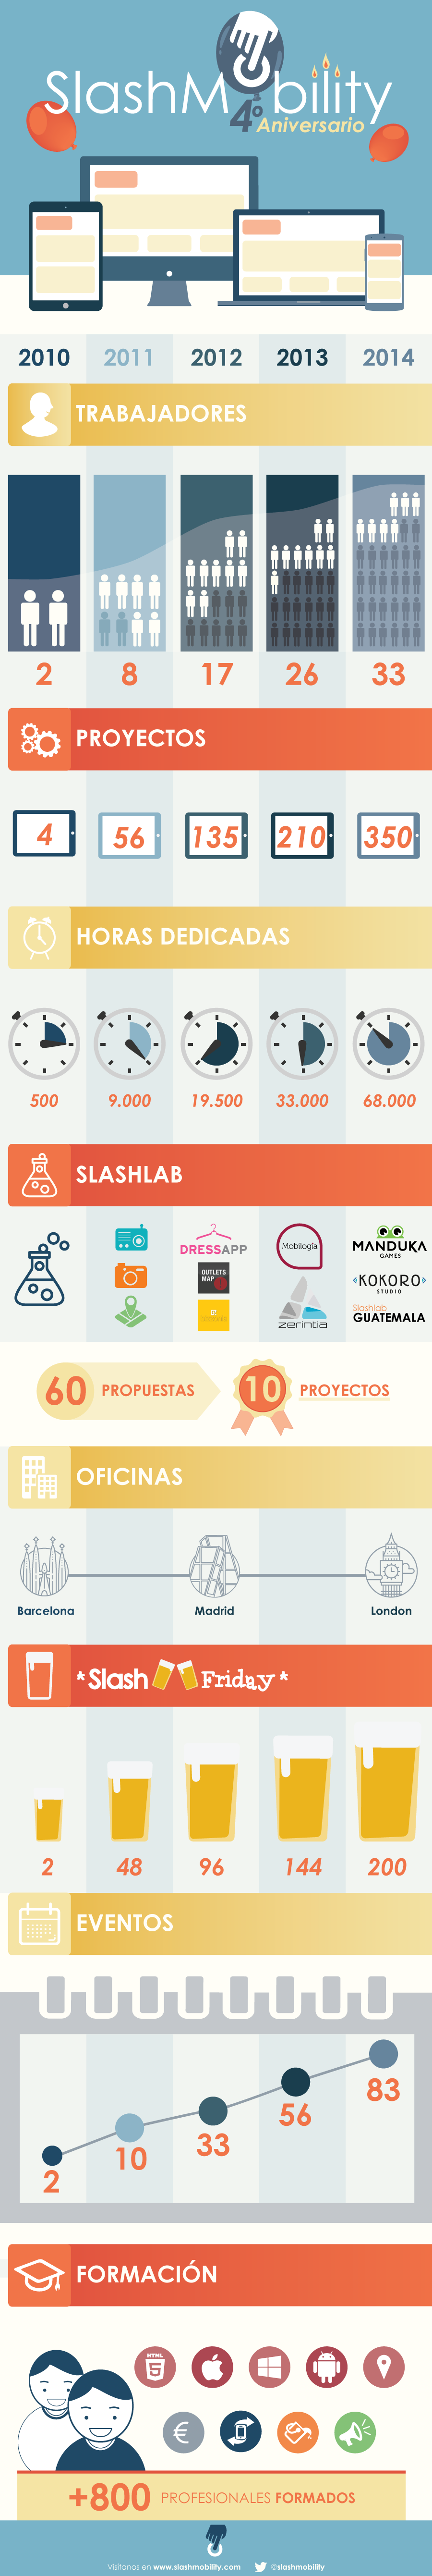 infografia_aniversario_v4